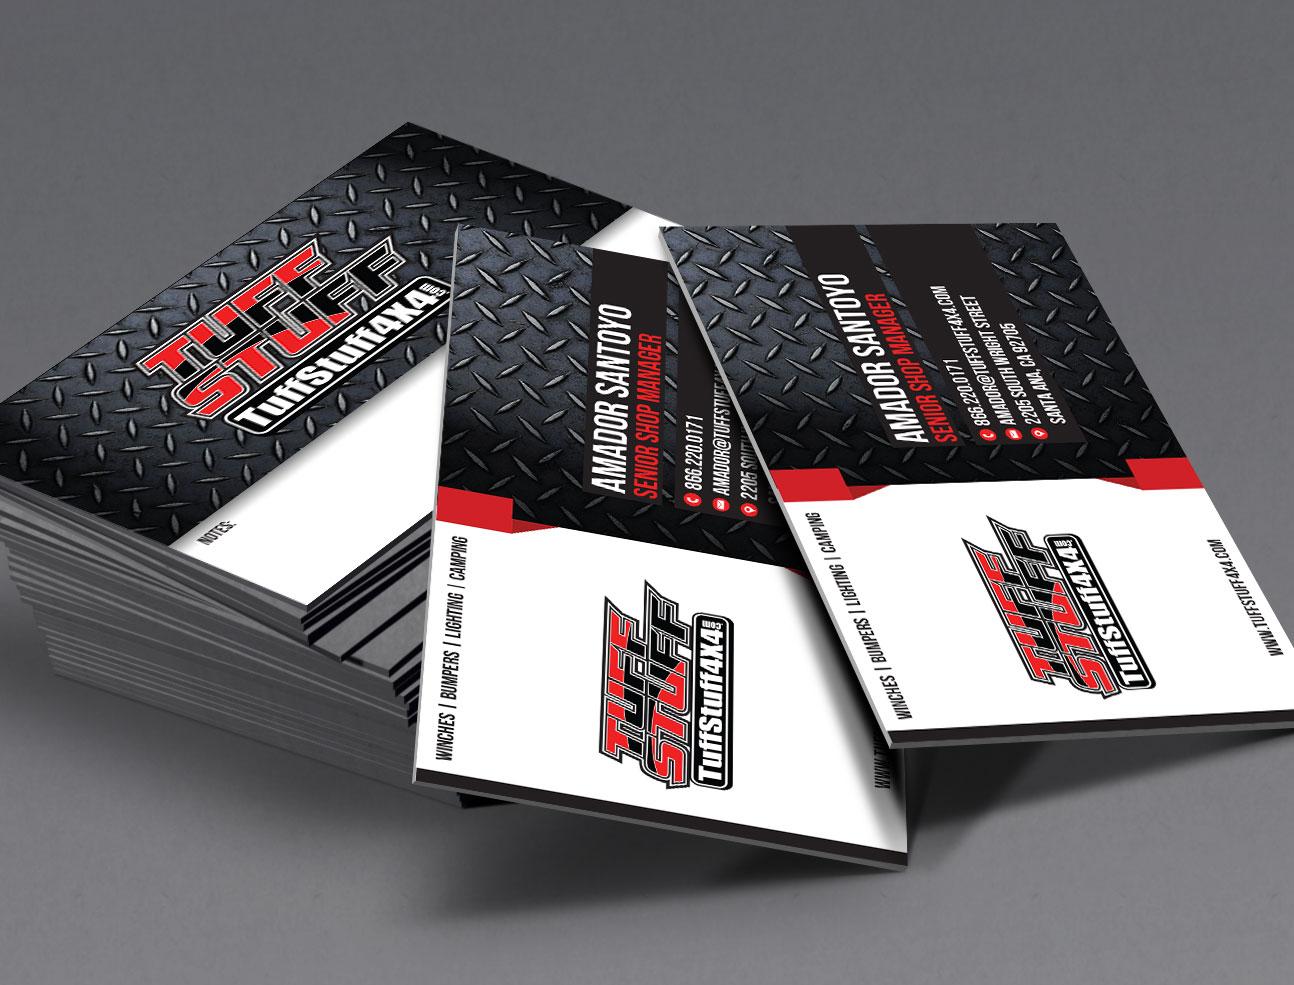 Tuff Stuff Business Cards - Damien Komala